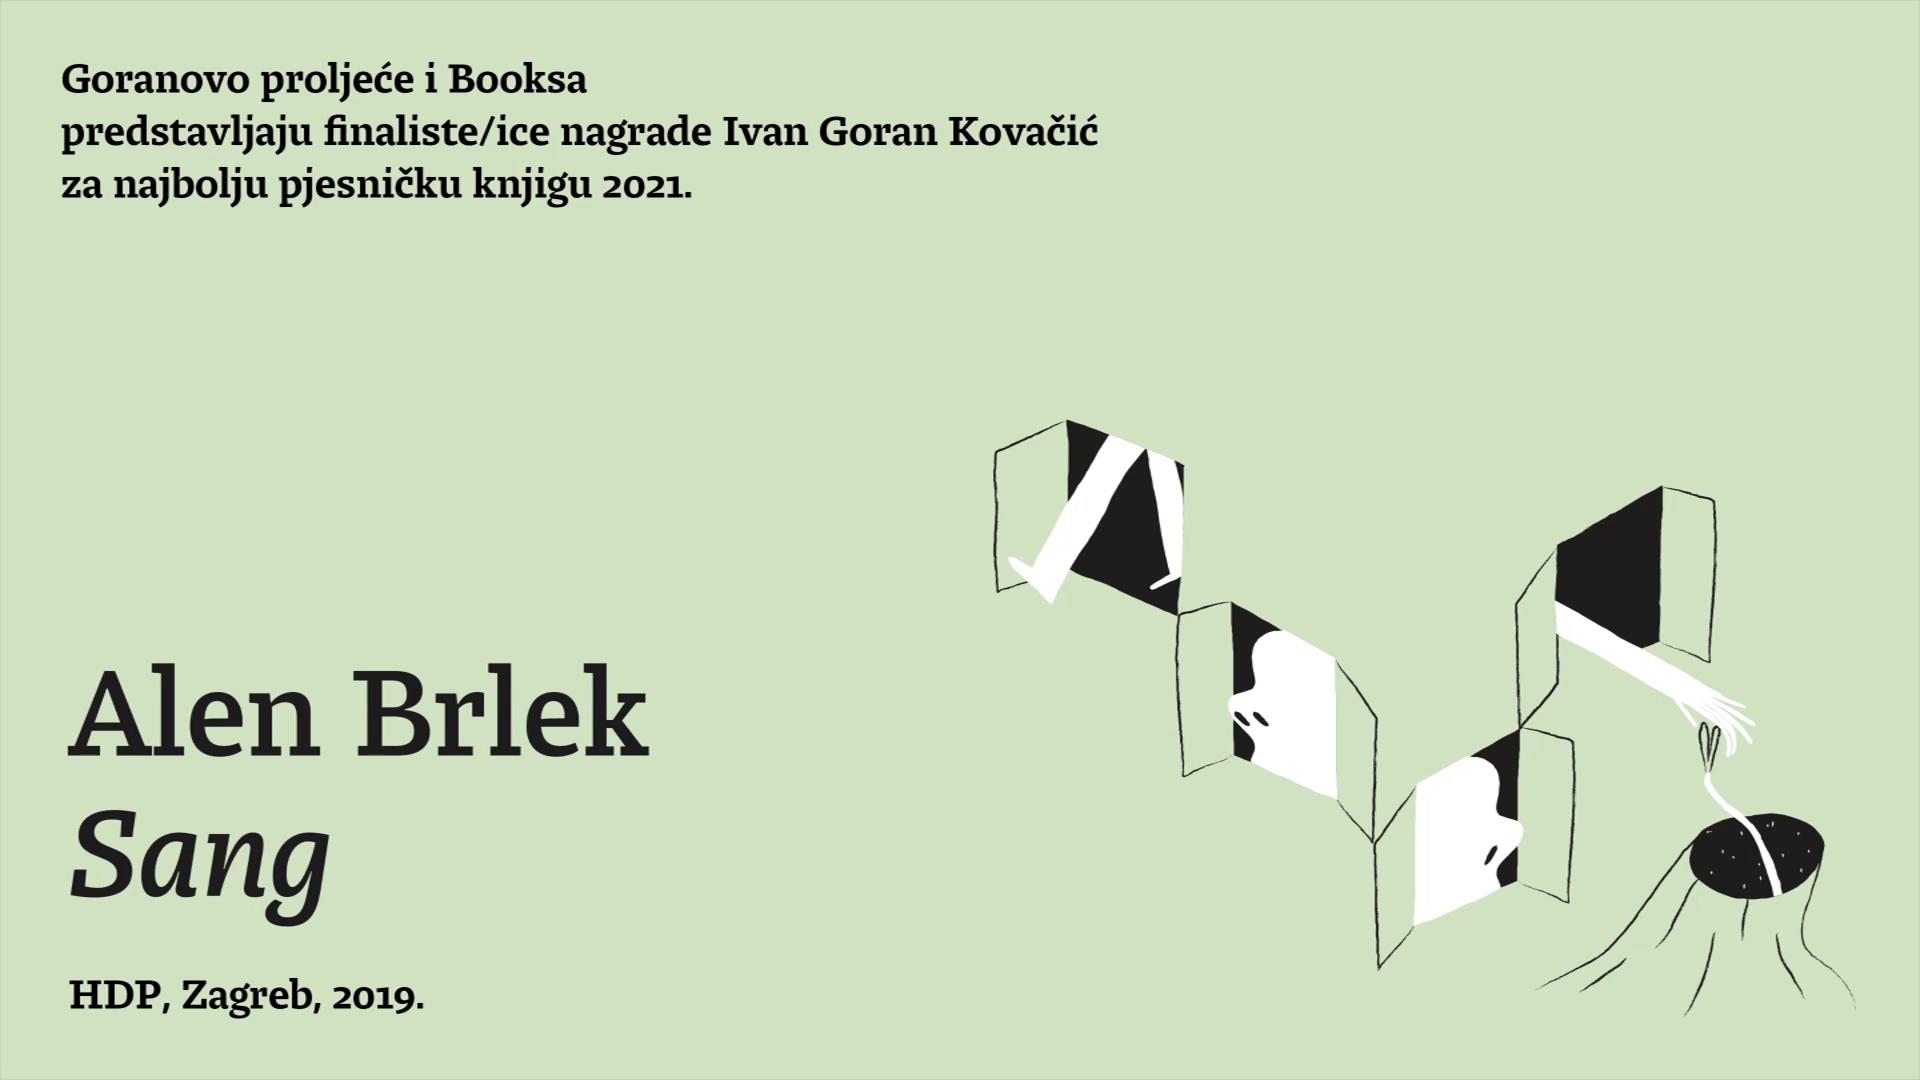 Predstavljanje finalista nagrade Ivan Goran Kovačić: Alen Brlek